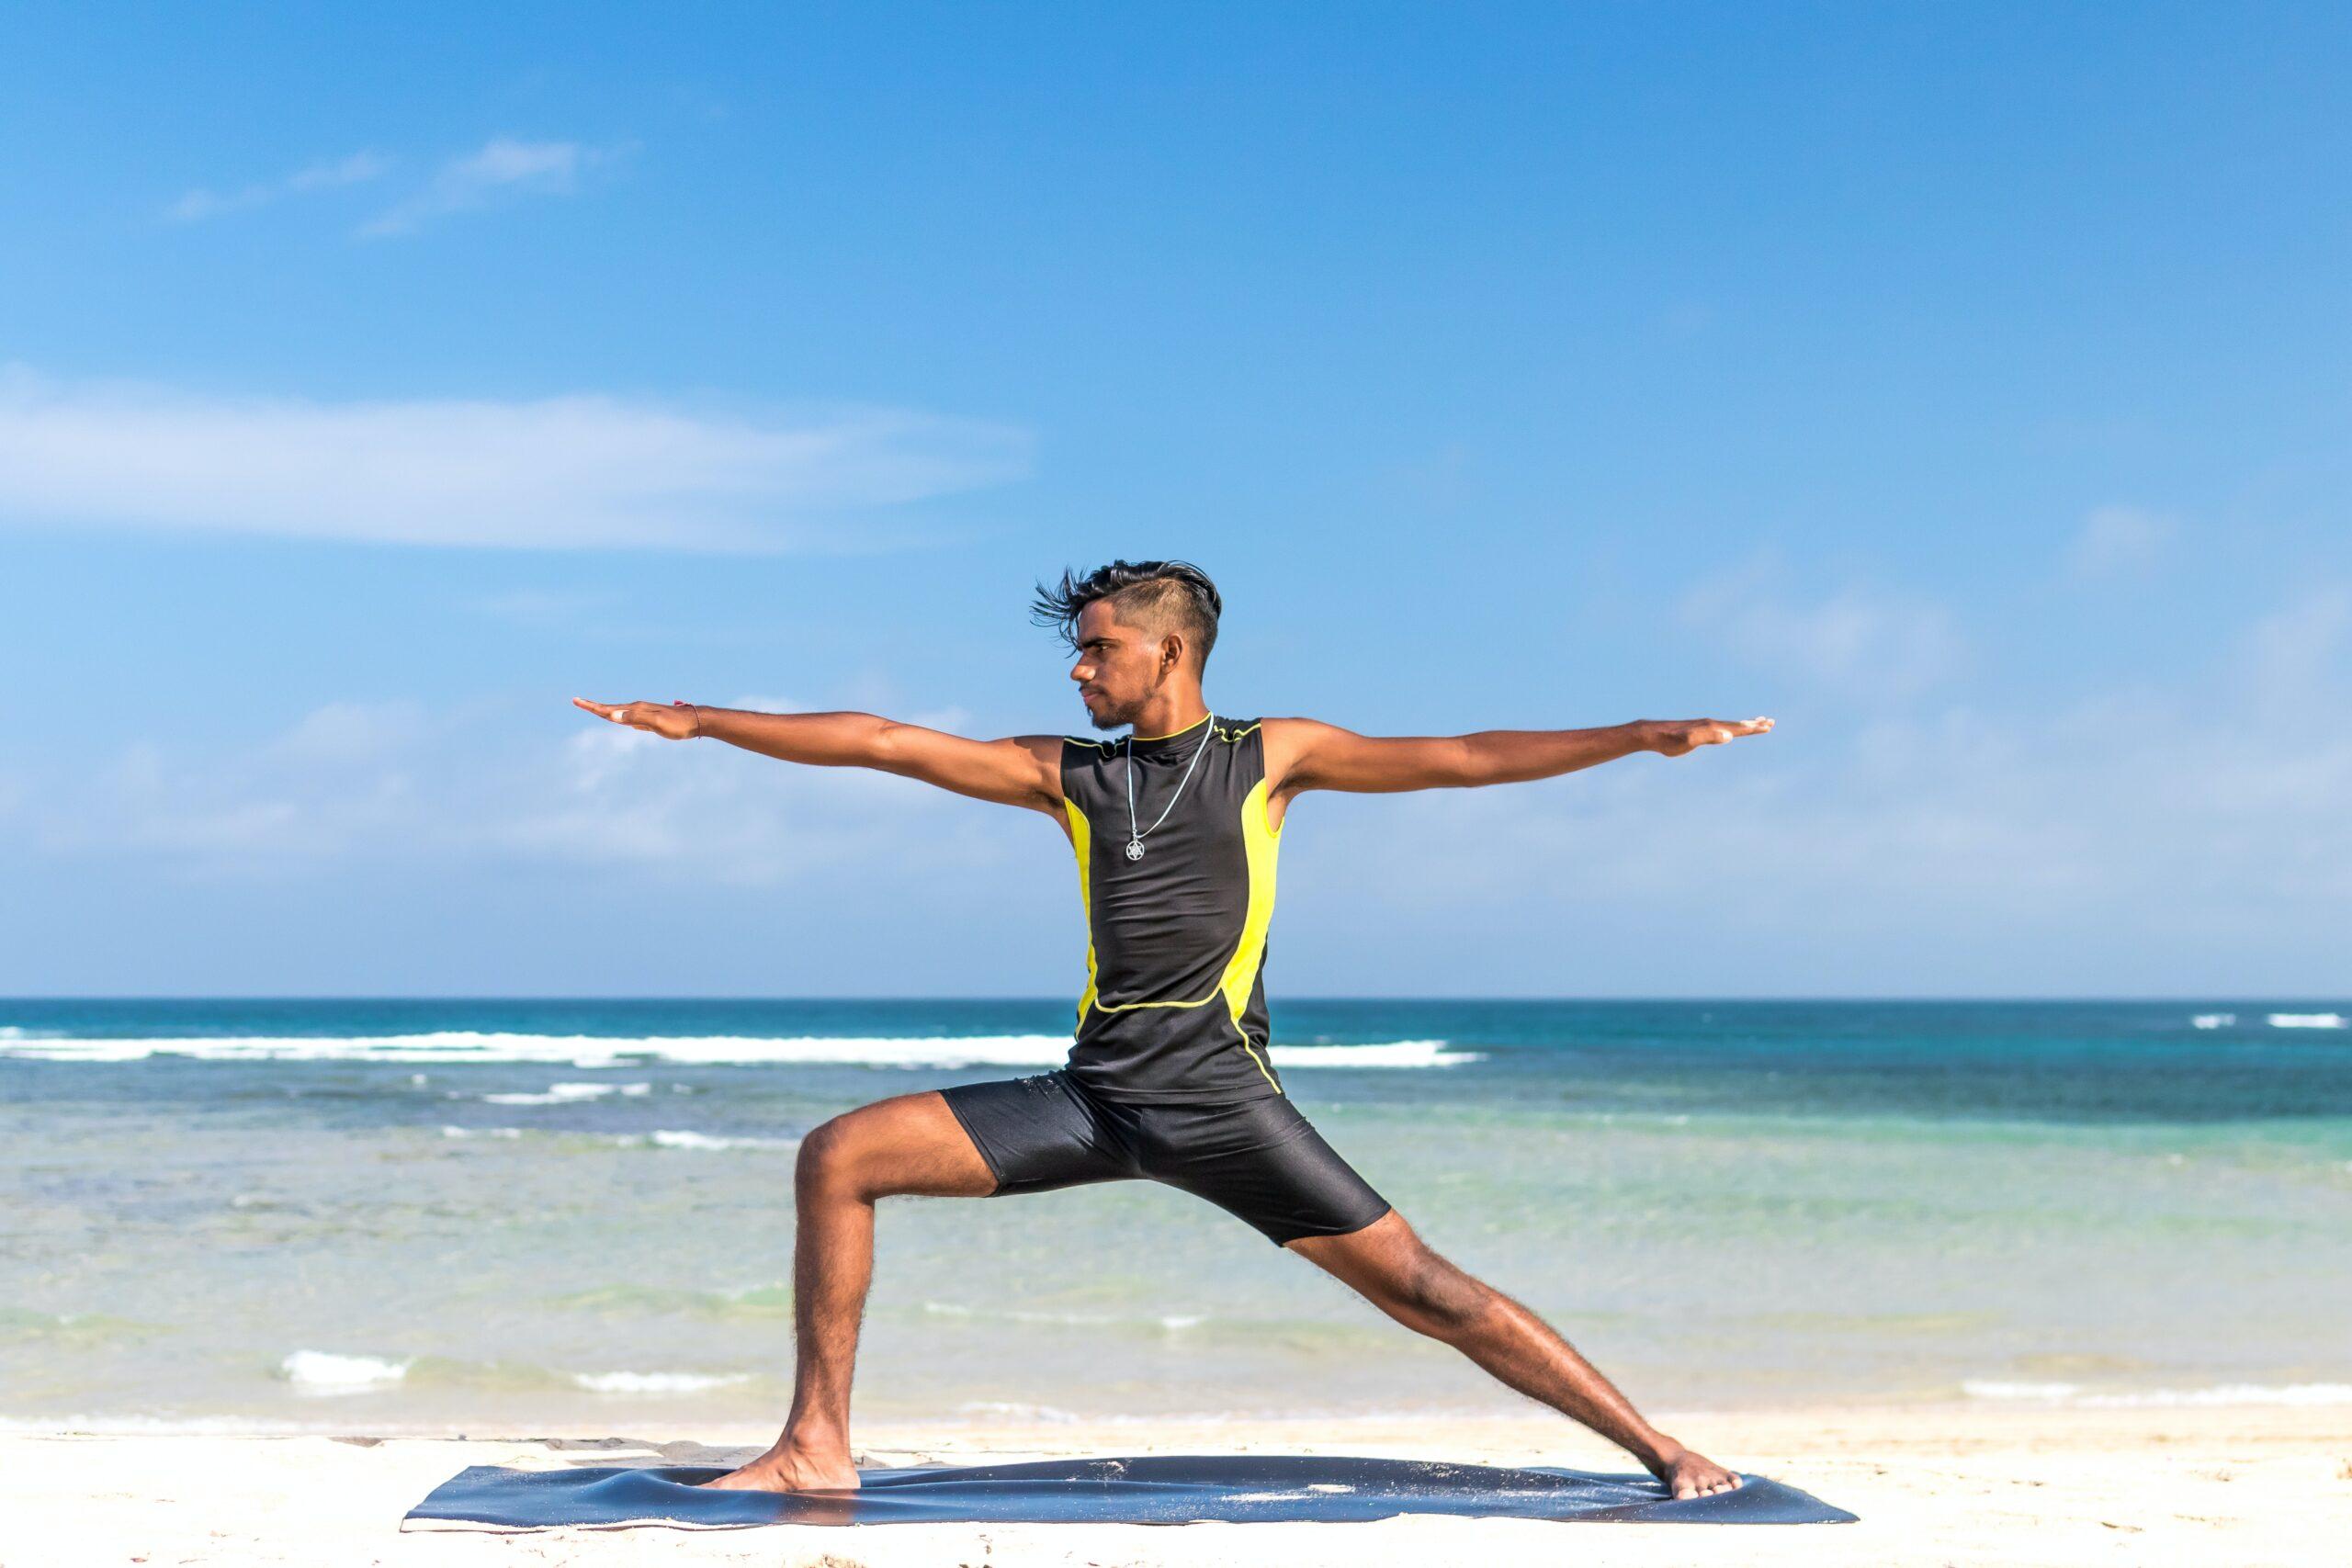 artem-beliaikin-Man on beach in warrior asana-unsplash